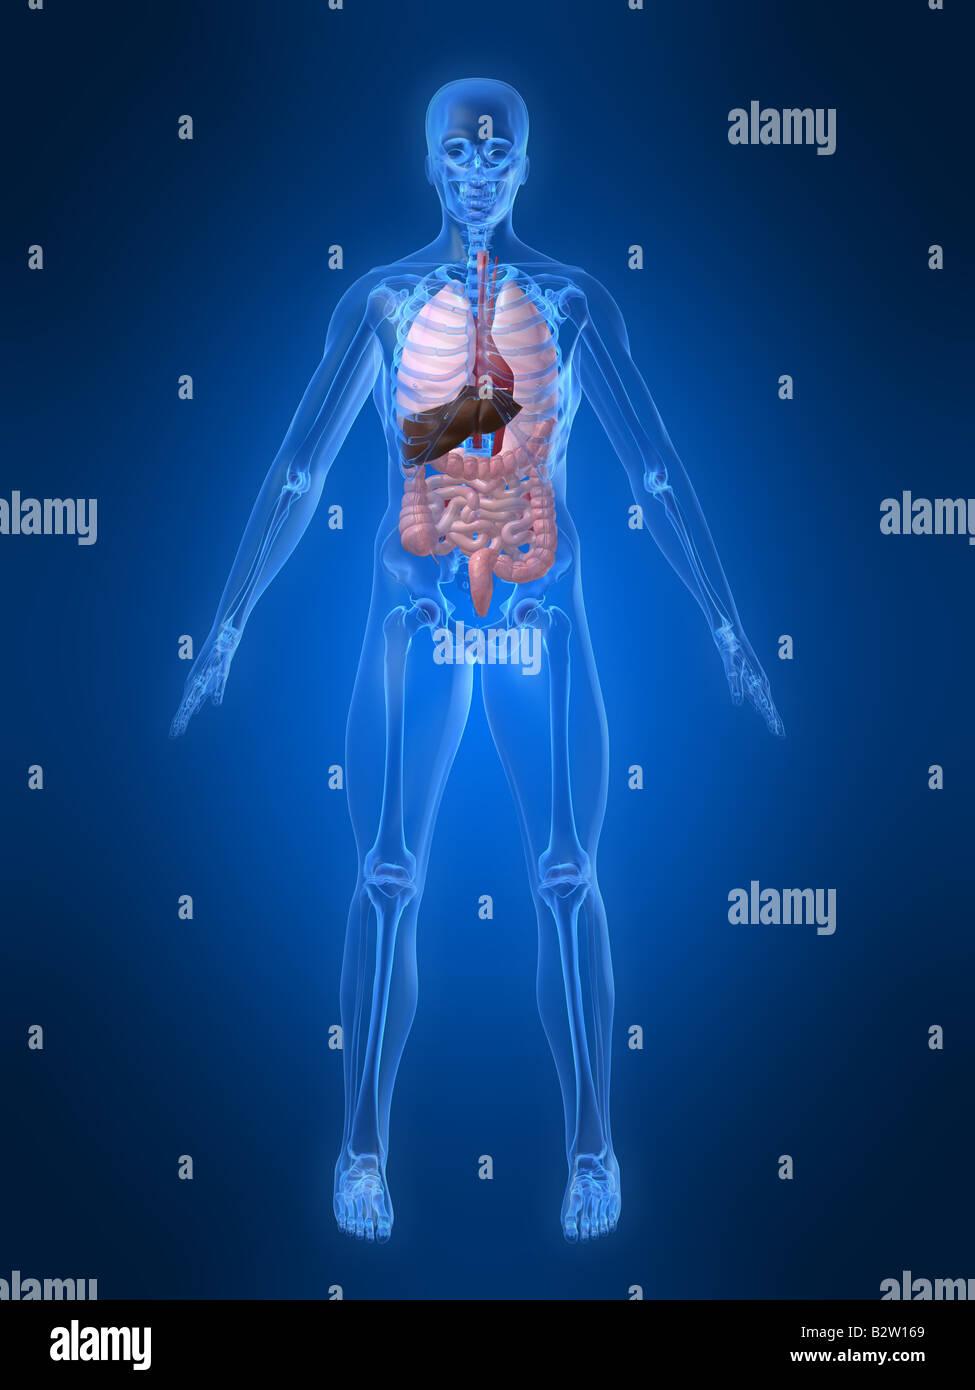 anatomía humana Imagen De Stock